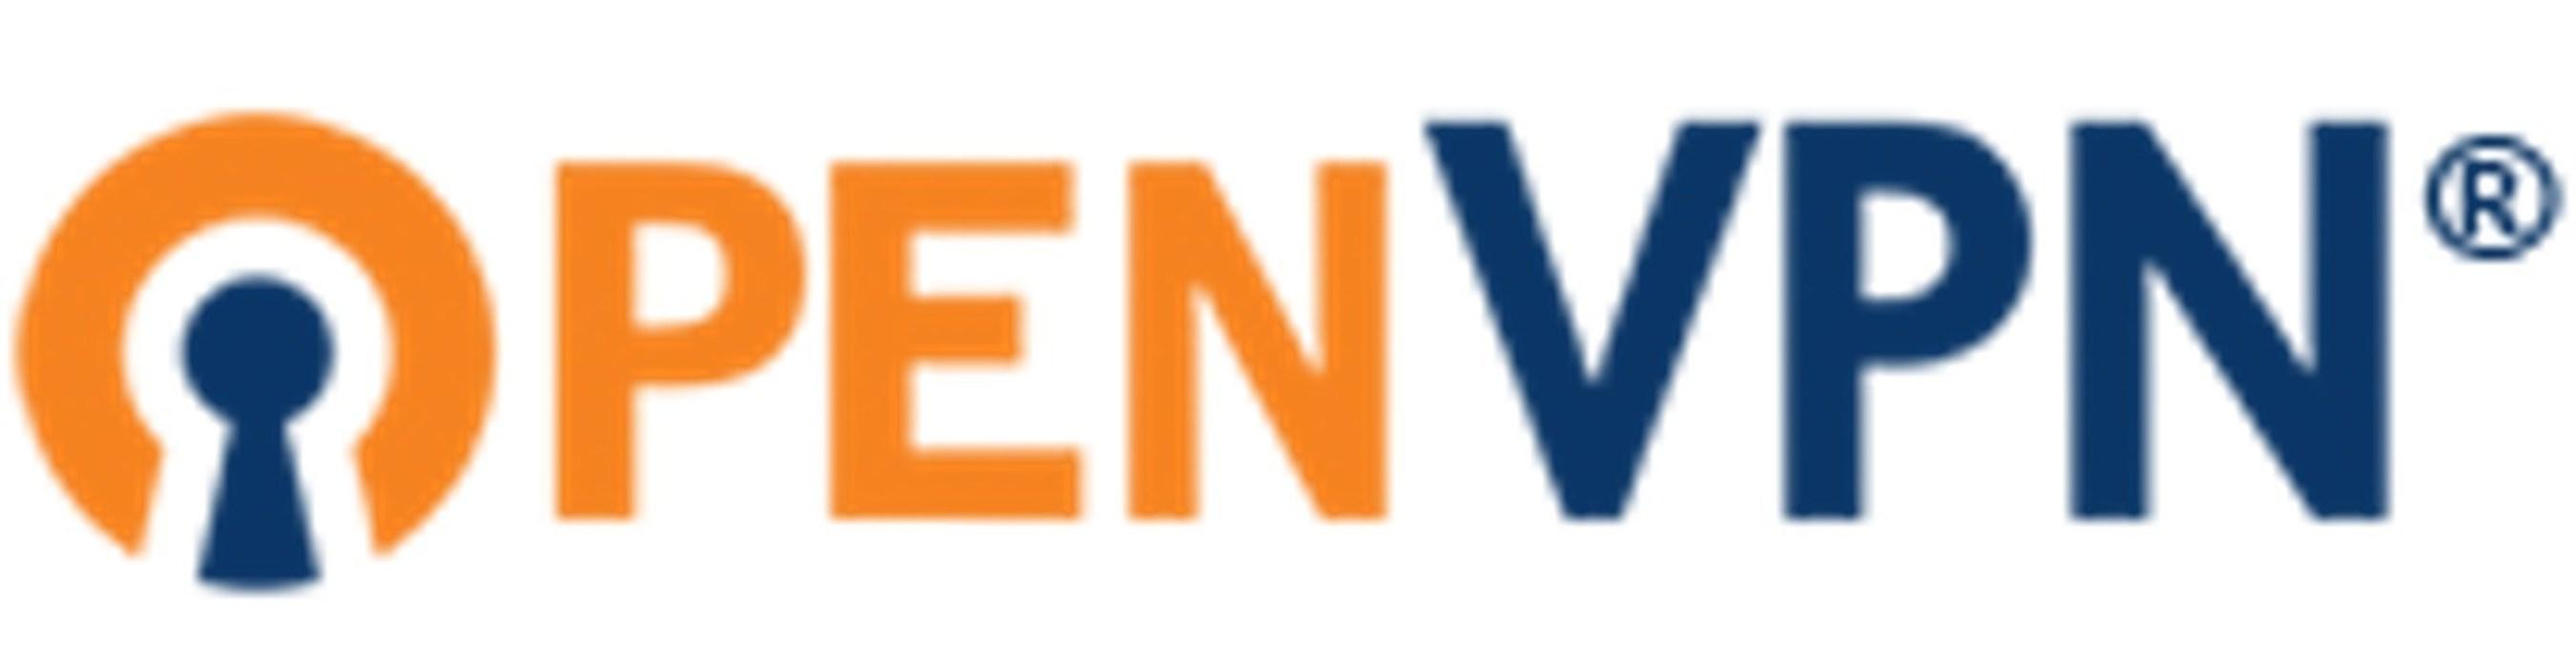 Logo of OpenVPN, now available through the Amazon Web Services (AWS) marketplace.